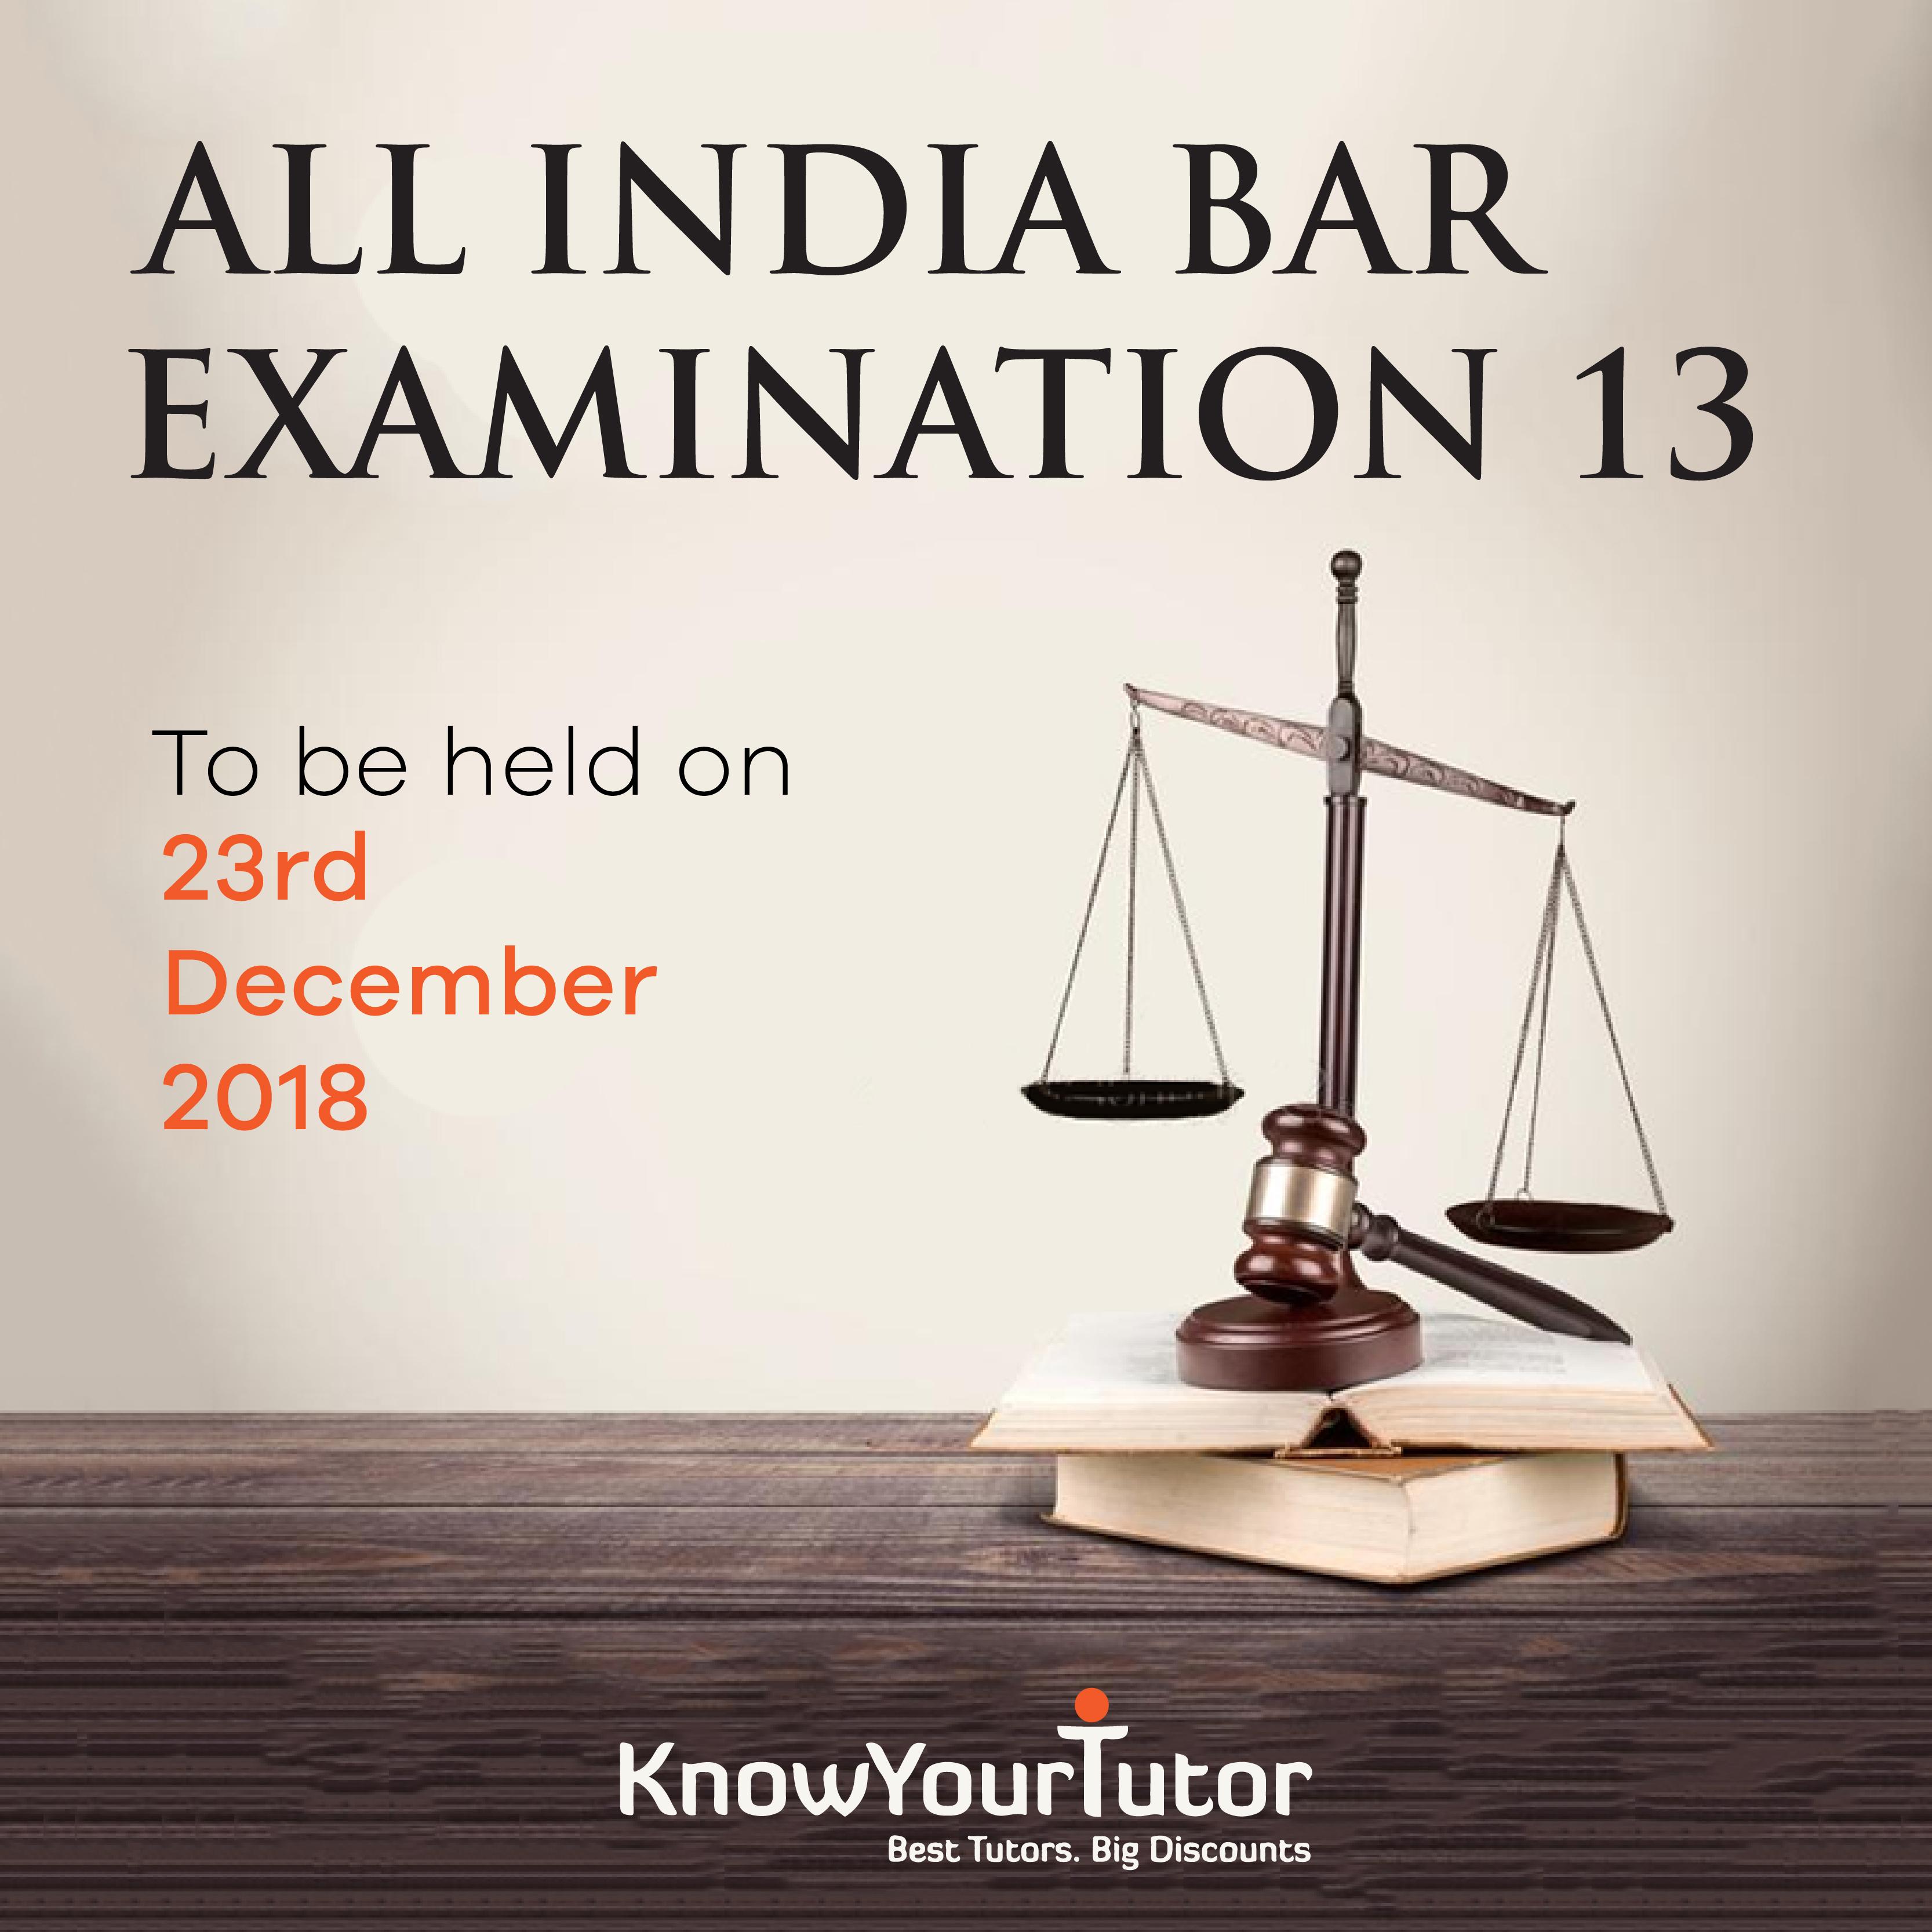 ALL INDIA BAR EXAMINATION XIII